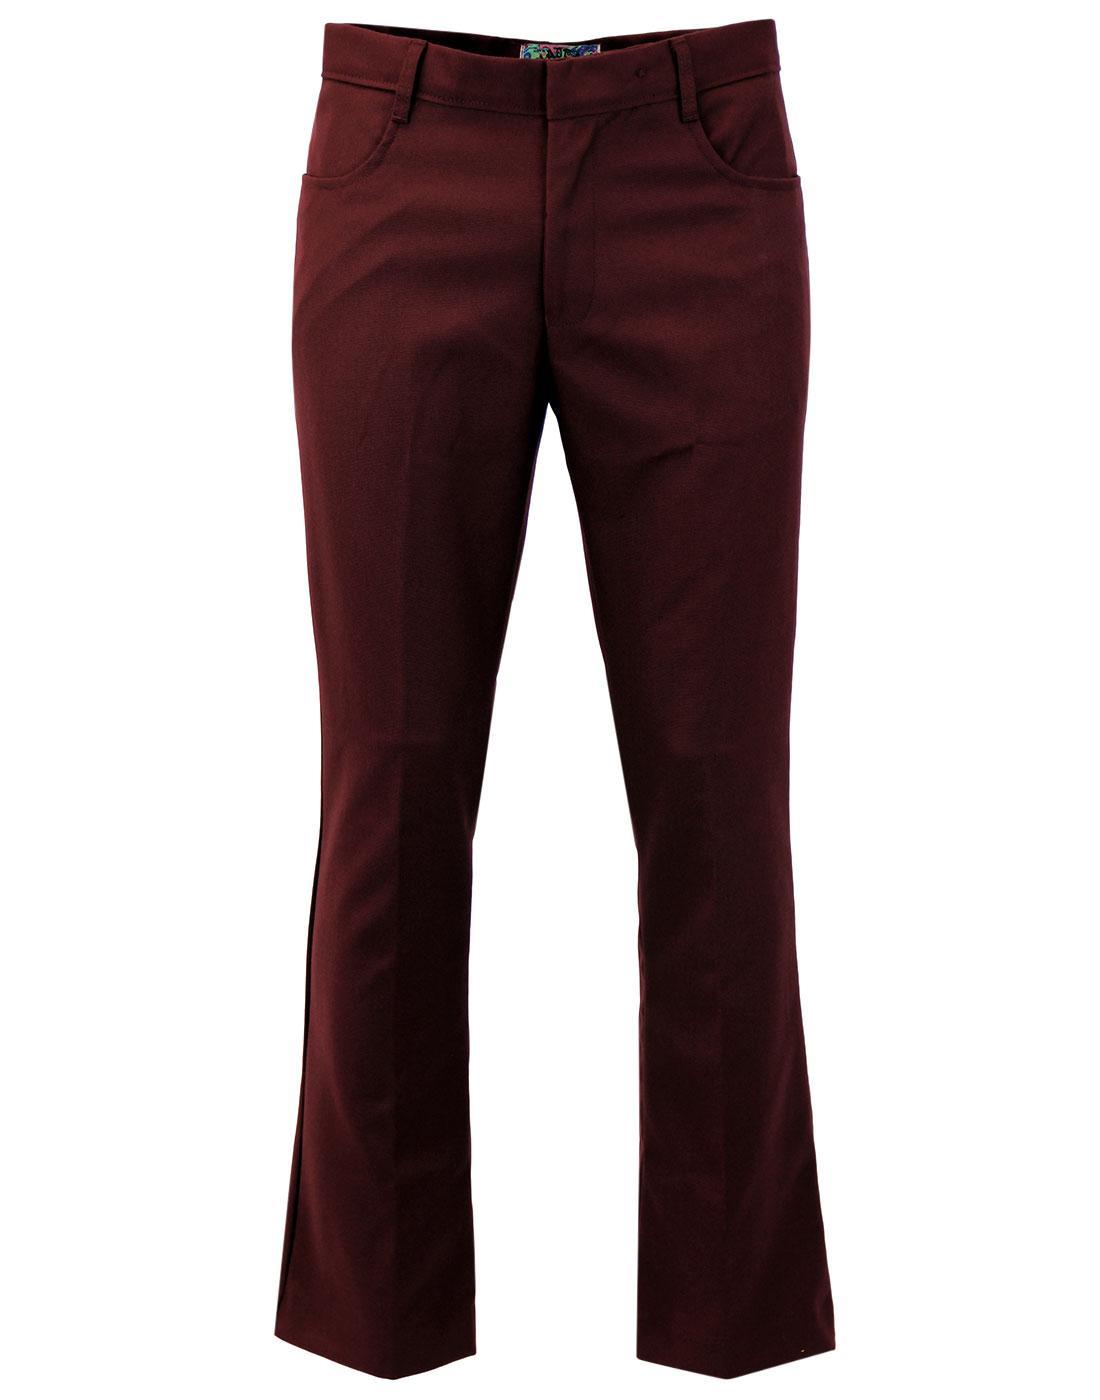 madcap-logan-bootcut-mod-hopsack-trousers-burgundy